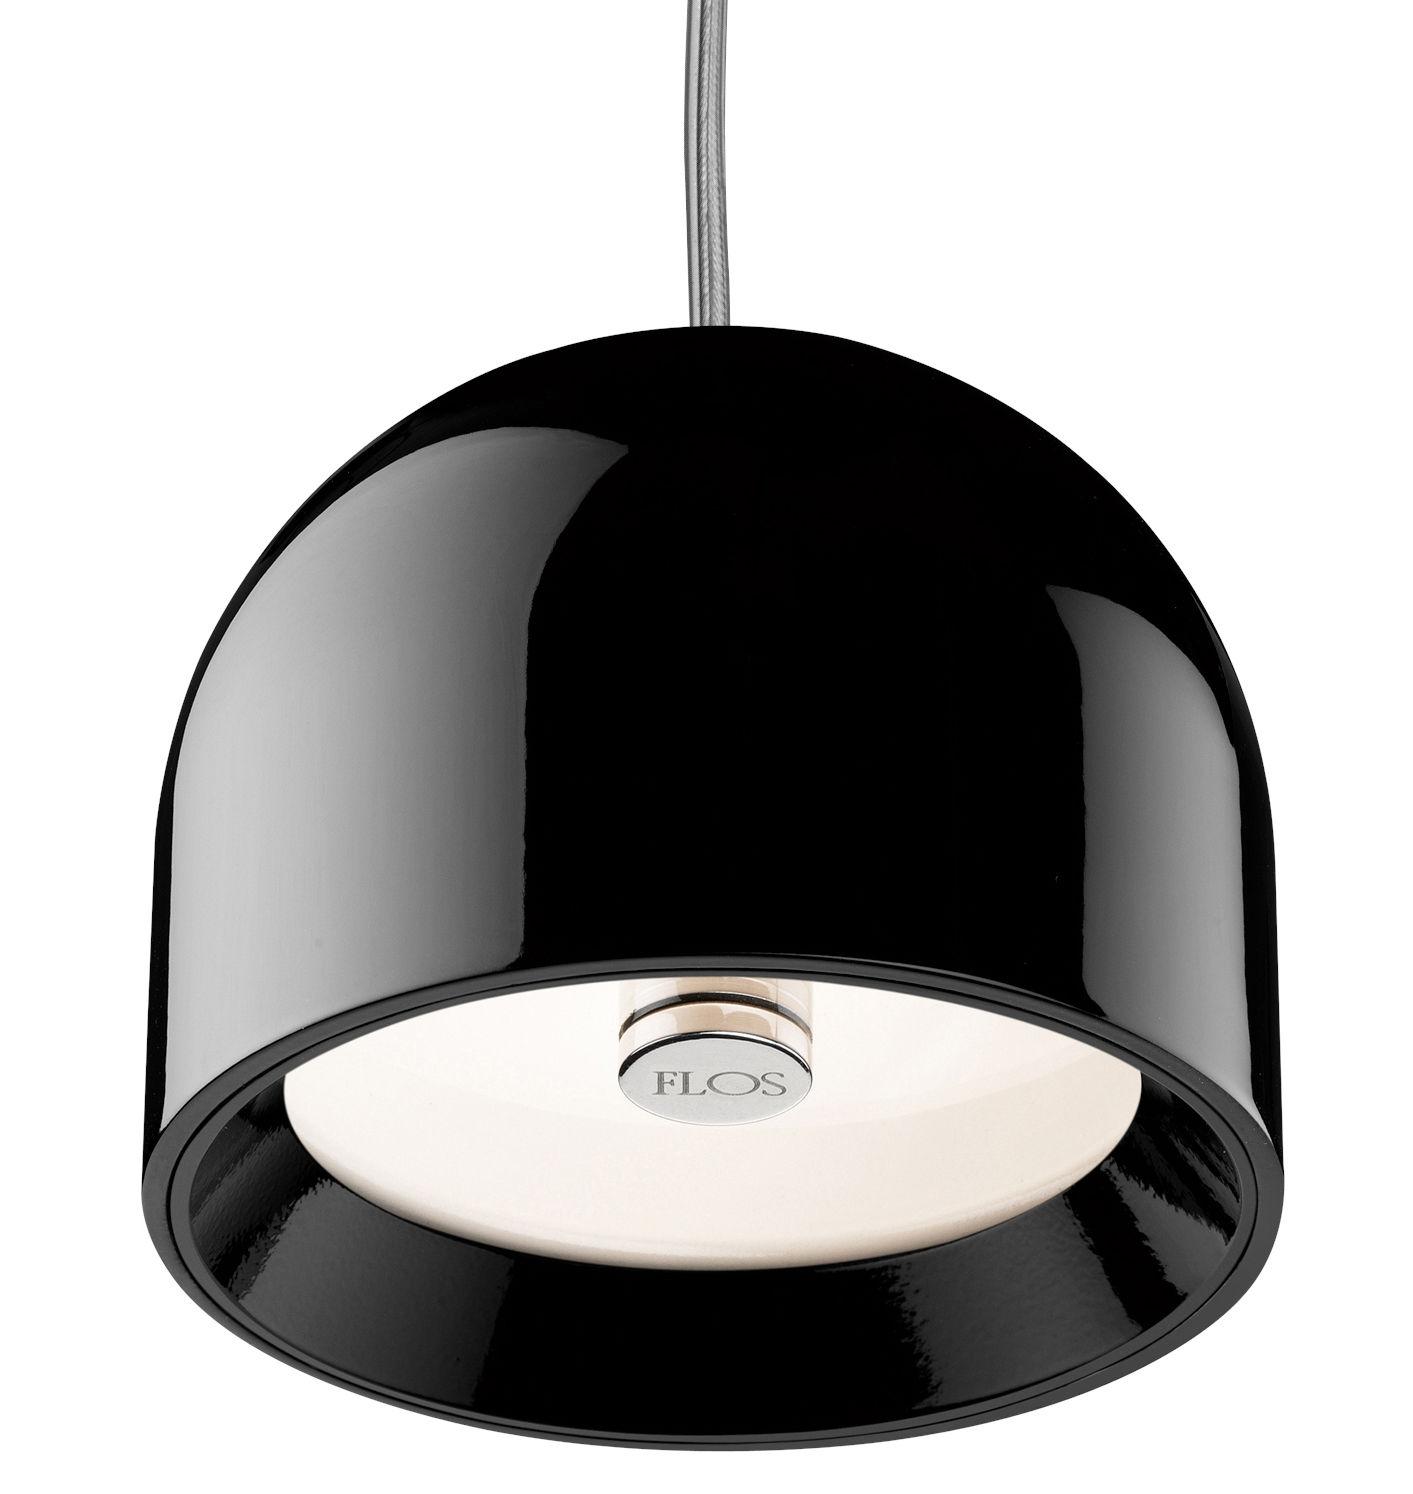 Leuchten - Pendelleuchten - Wan Pendelleuchte - Flos - Schwarz - Aluminium